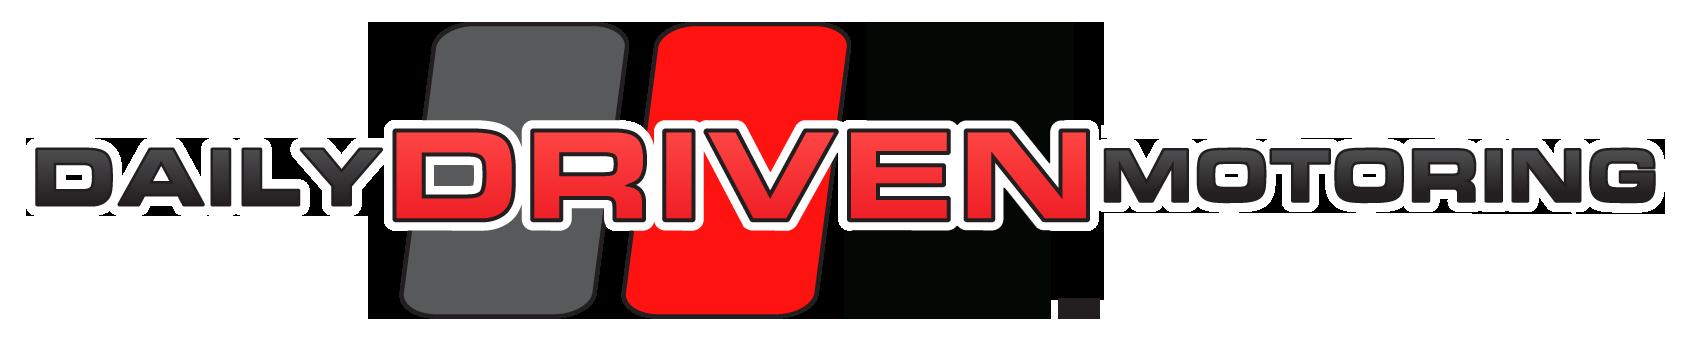 store-logo-main.png